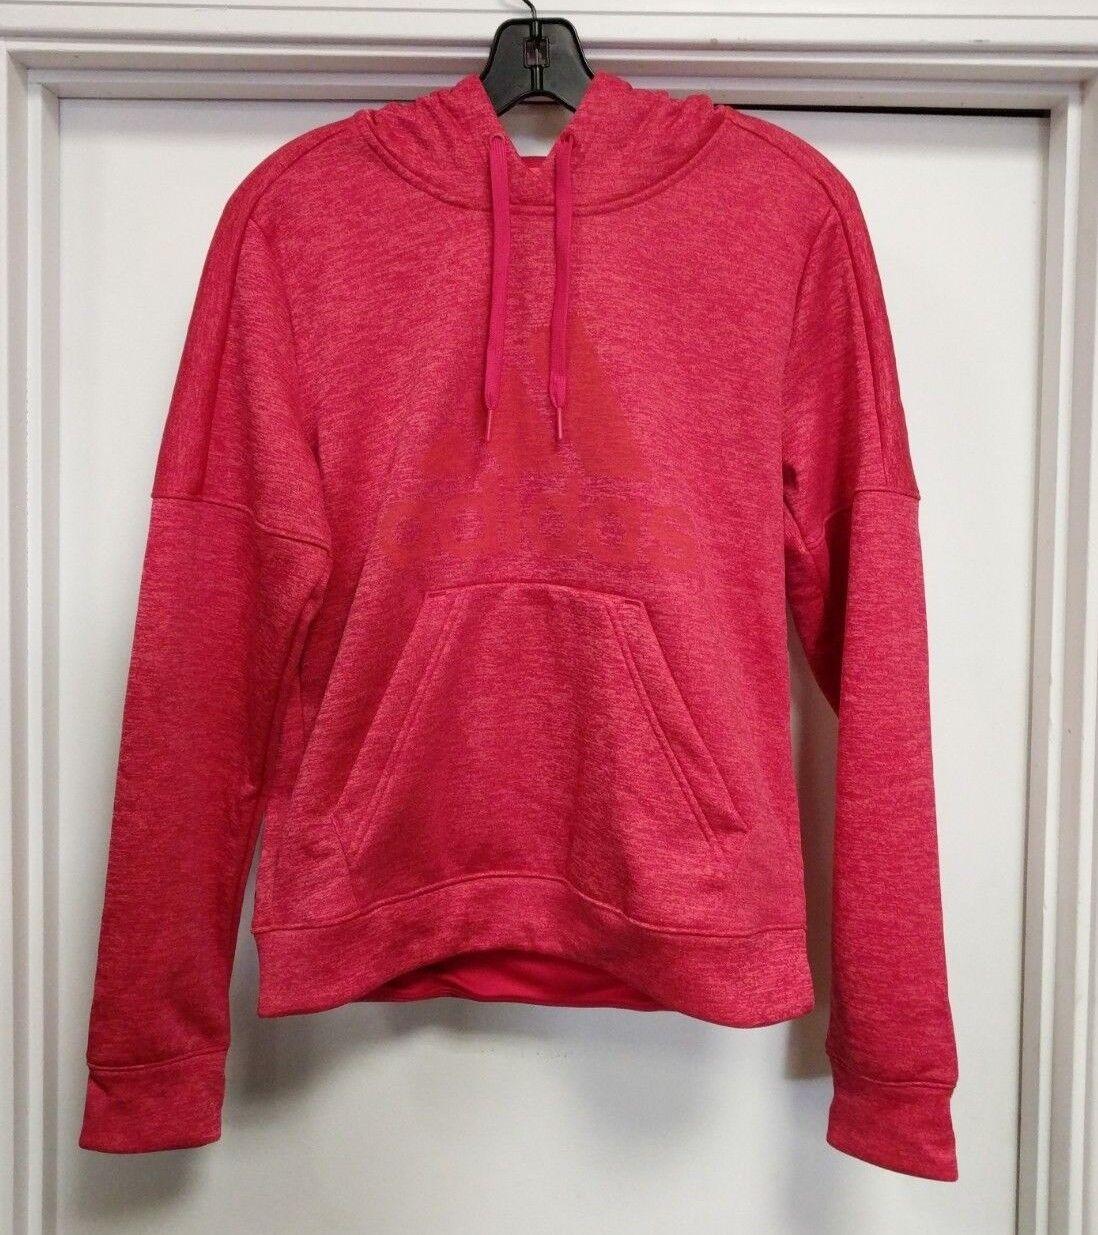 1X NWT ΞœΞΞ³Ξ΅ΞΈΞΏΟ' Ξ³Ο…Ξ½Ξ±ΞΉΞΊΟŽΞ½ Adidas SM Climawarm Ultimate Hoodie Αο Κόκκινο Ξ•Ξ½Ξ΅ΟΞ³ΟŒ Φορτίο $ 55